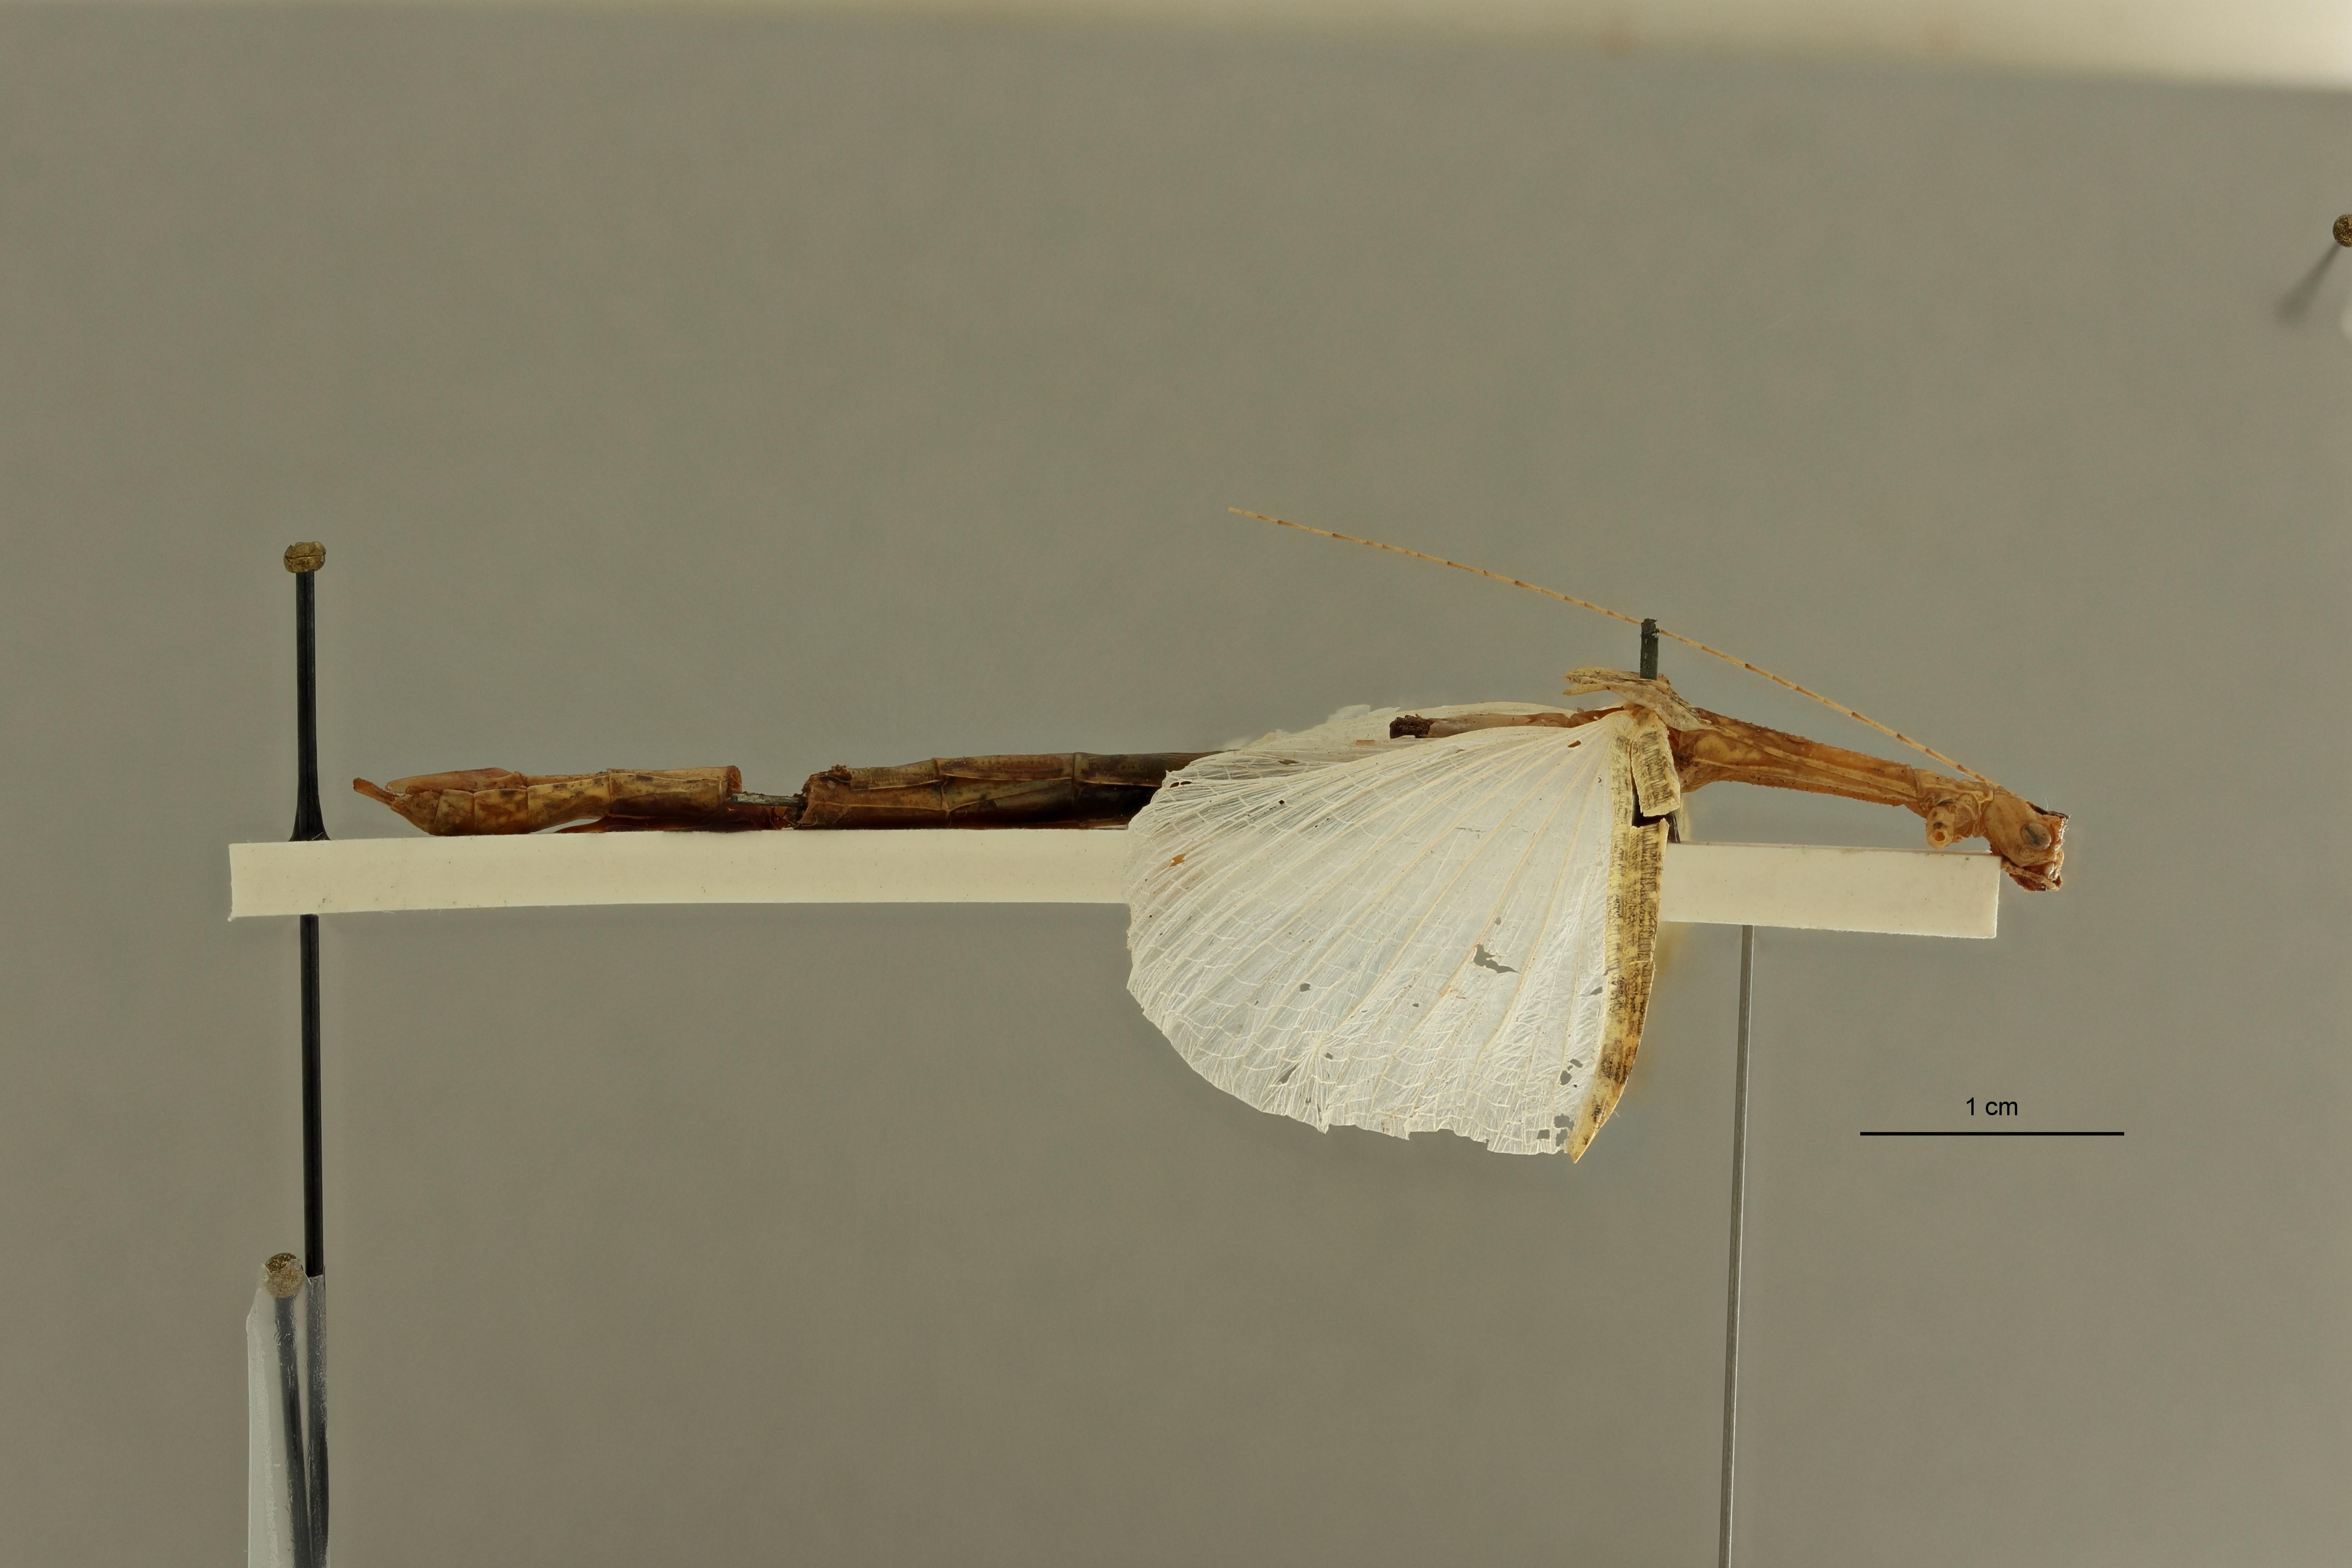 Aruanoidea analis ht L ZS PMax Scaled.jpeg